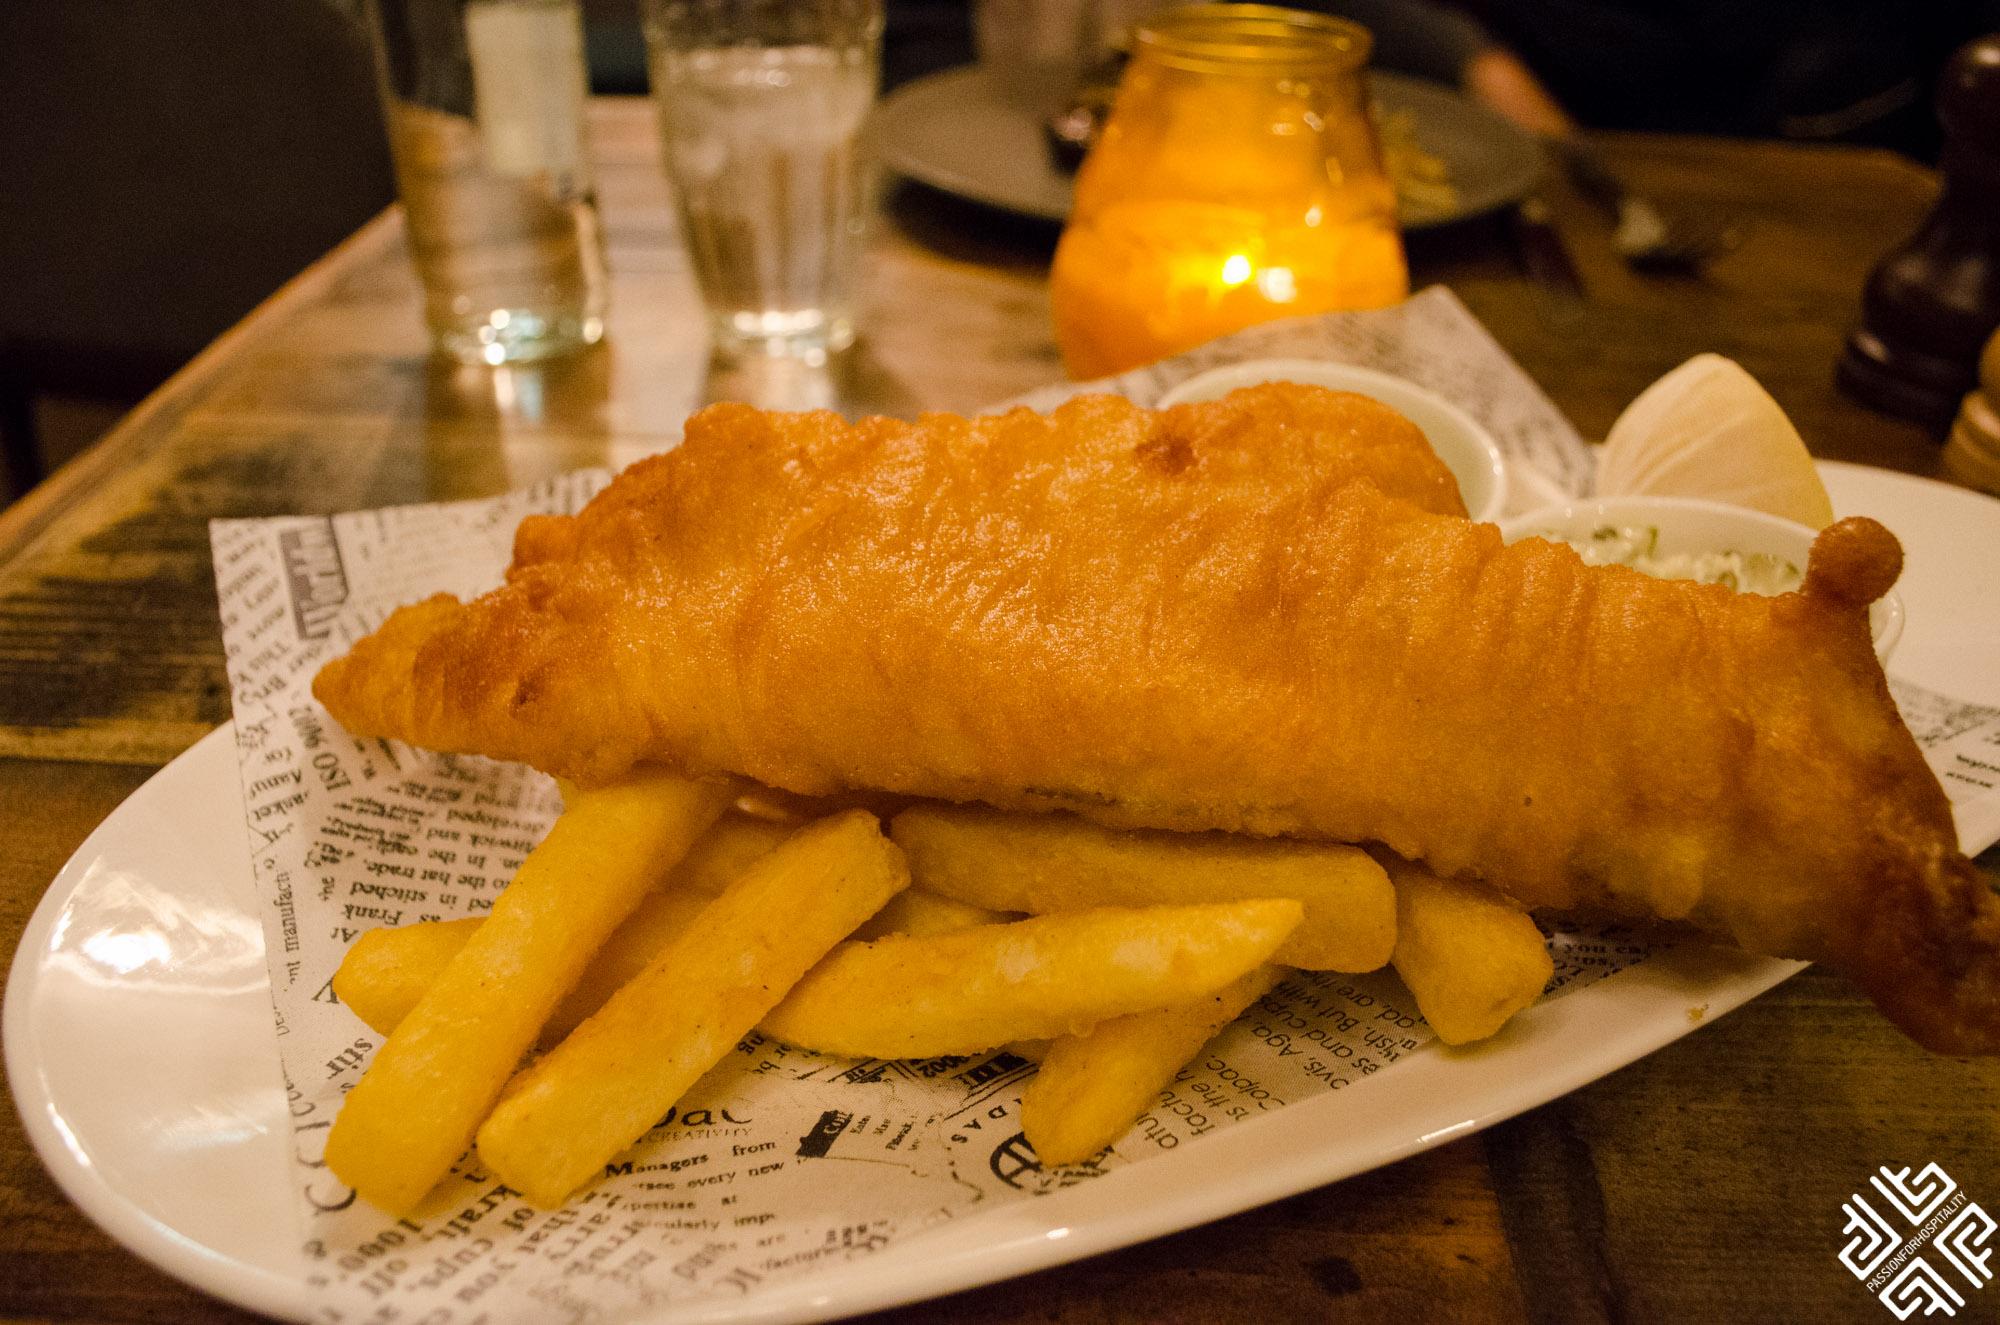 victoria-inn-peckham-london-restaurant-1